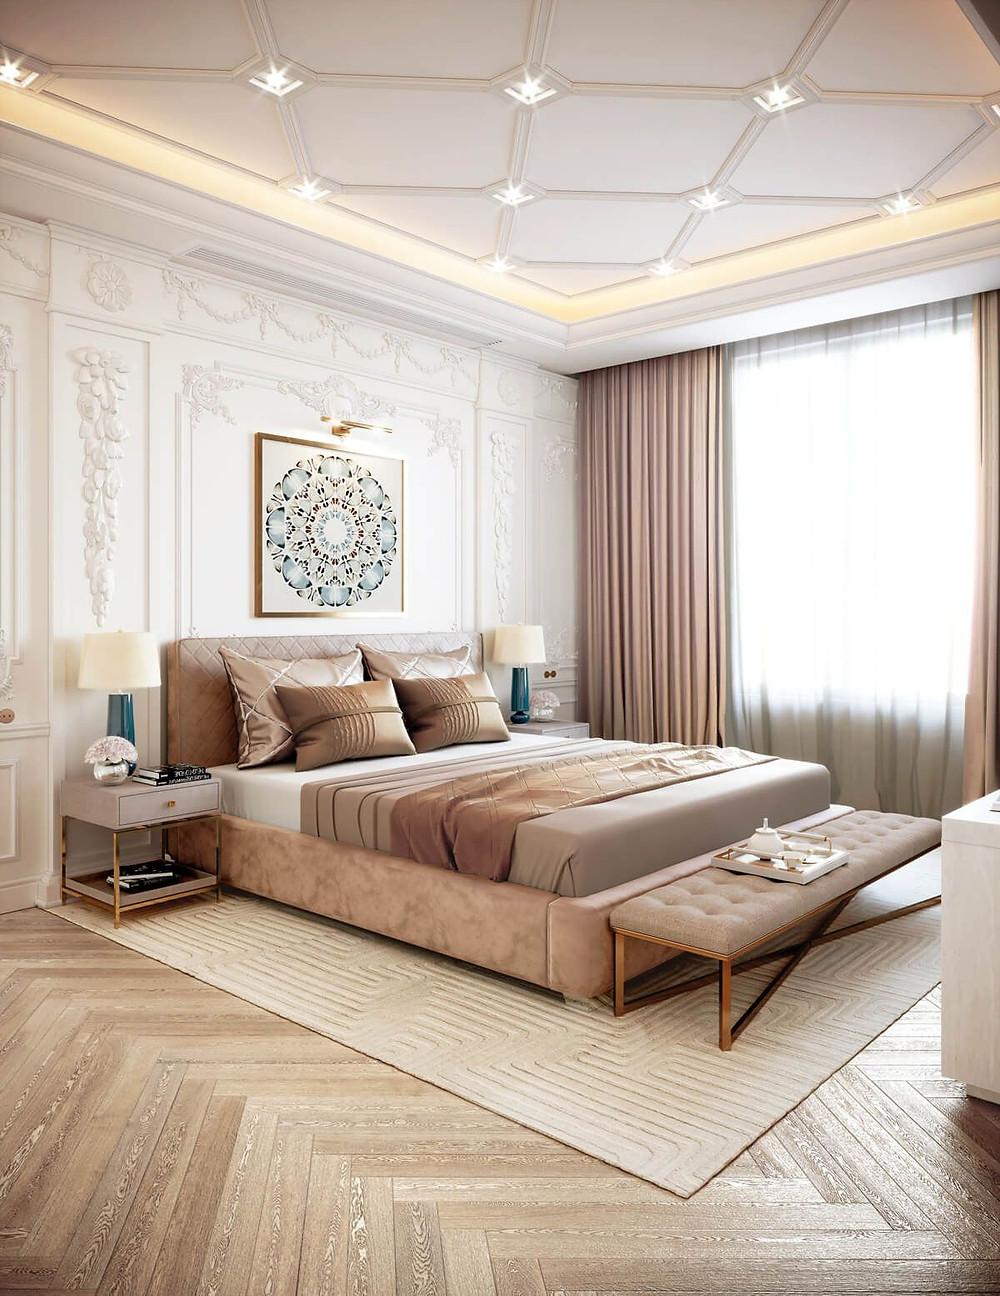 Single Layered False Ceiling, false ceiling ideas, geometric false ceiling designs, lakkad works, home interiors, bedroom